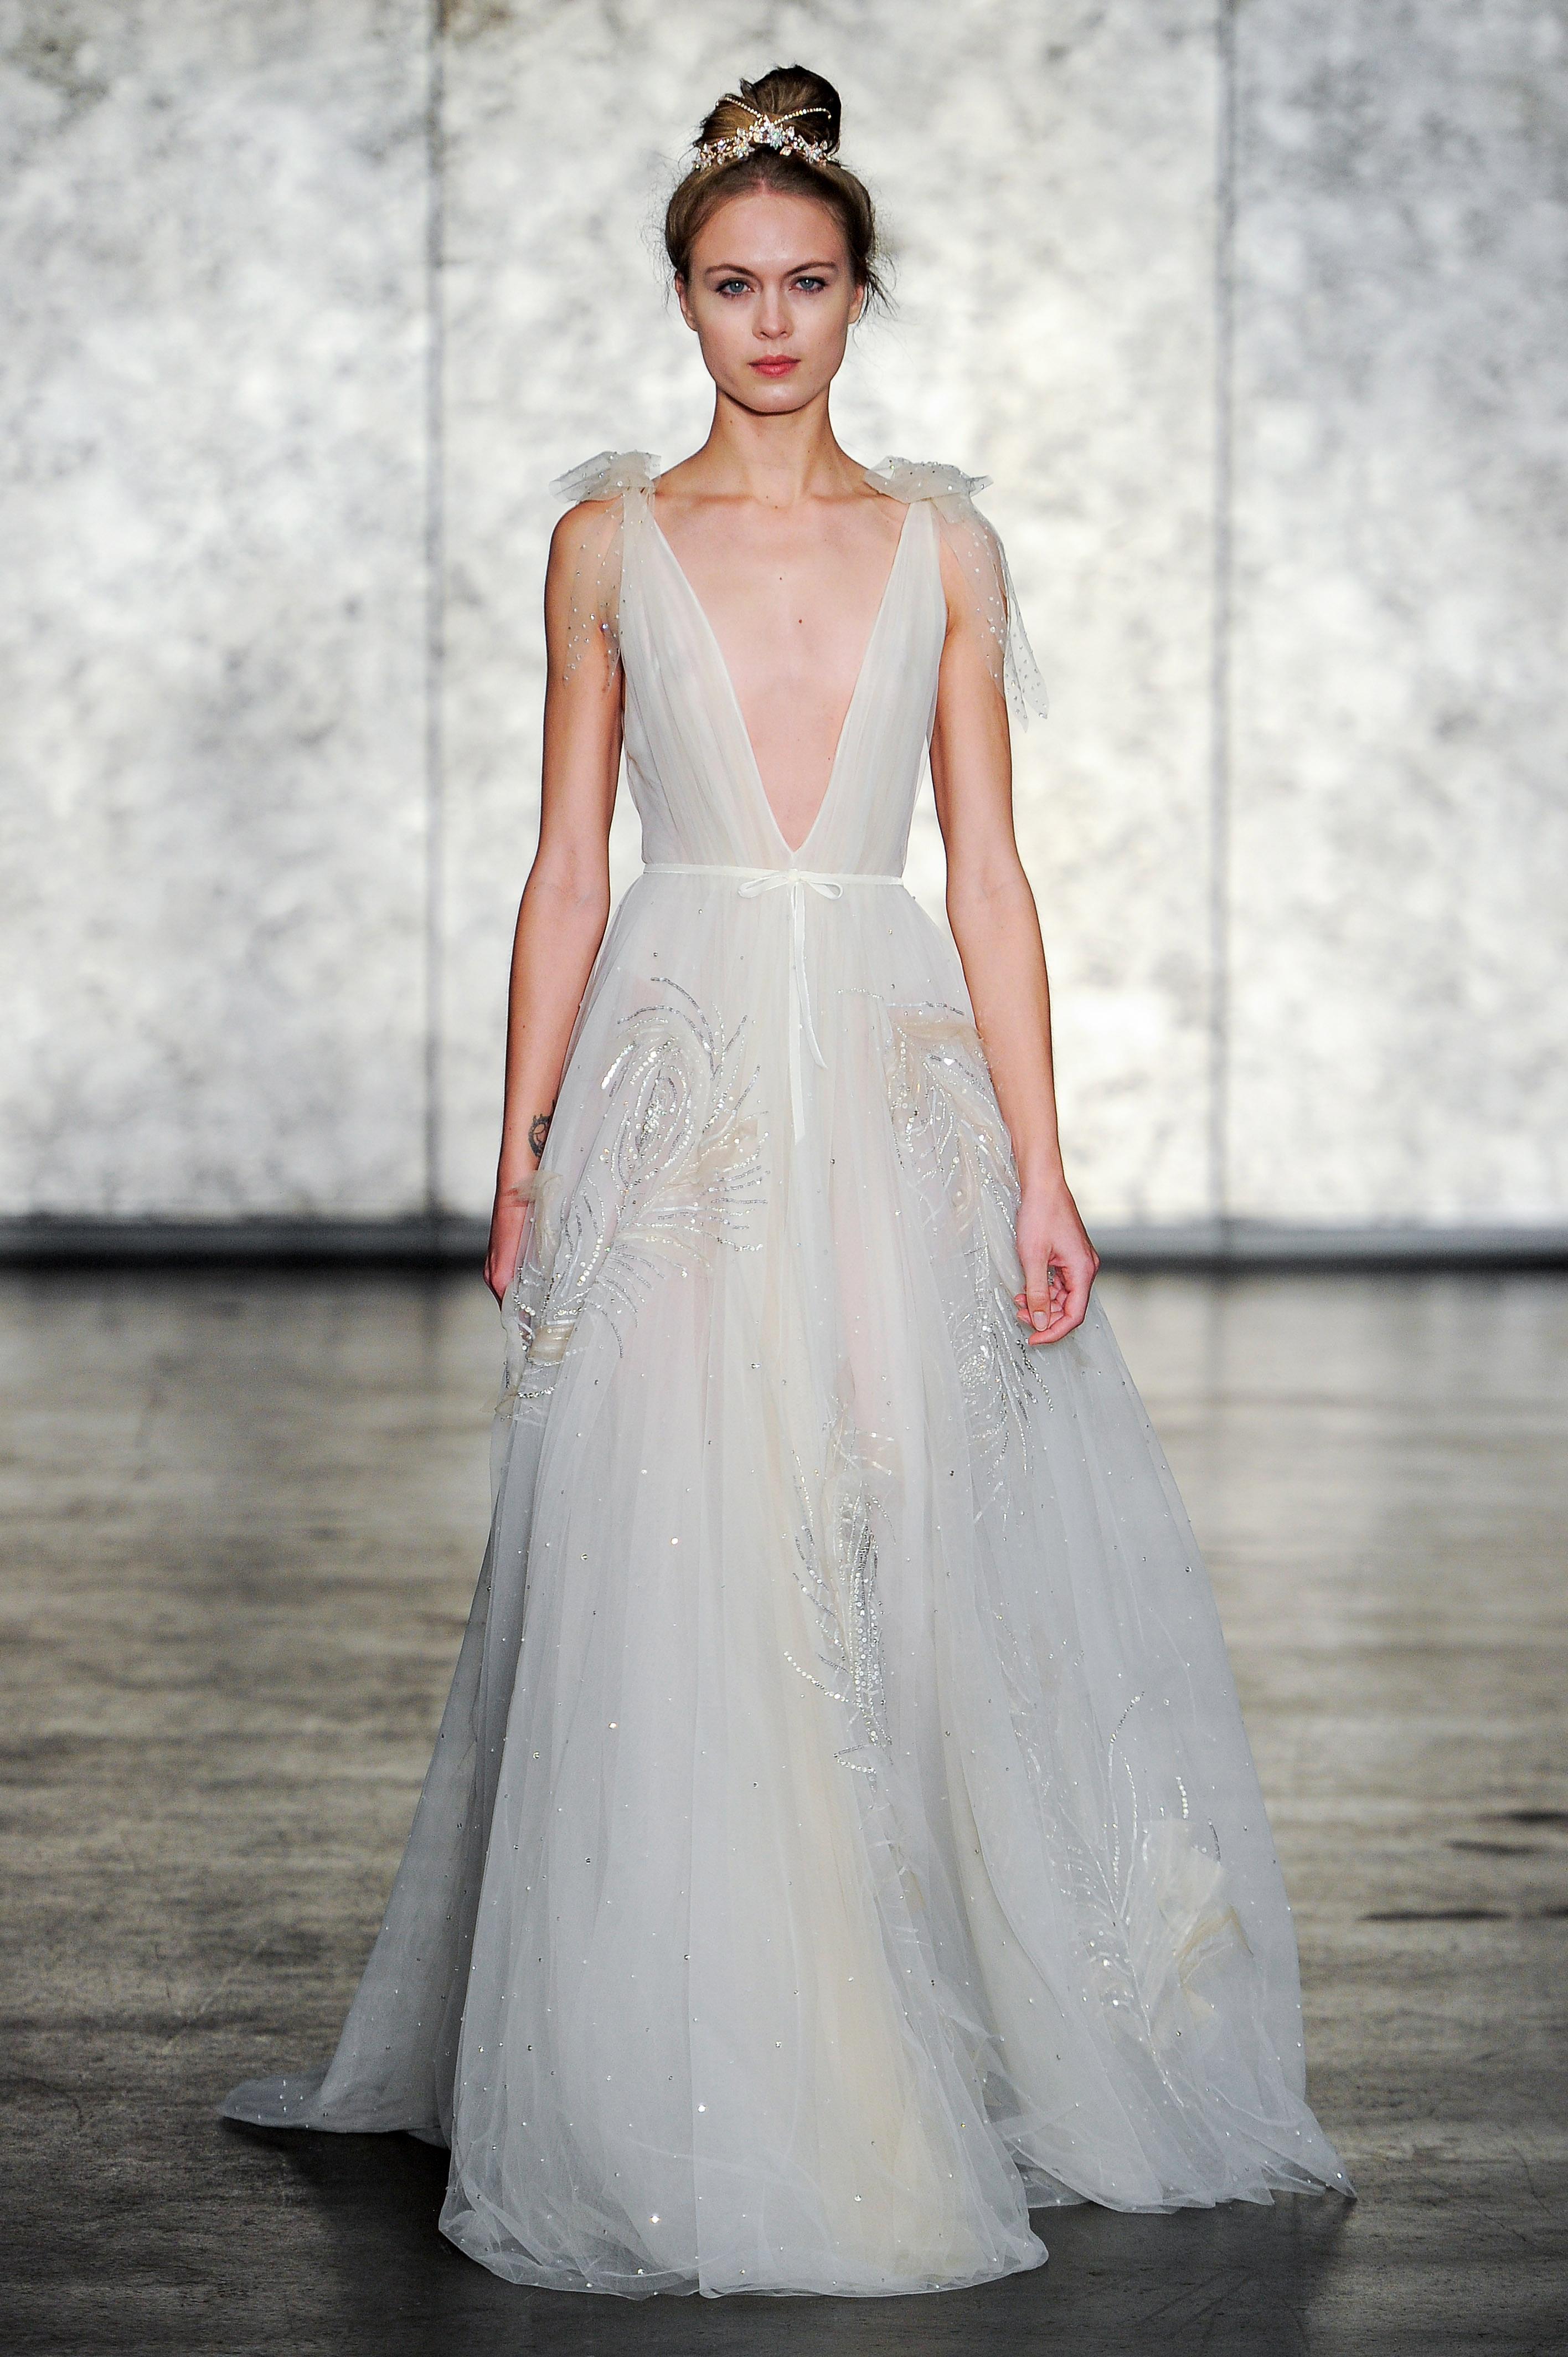 inbal dror wedding dress fall 2018 deep v shoulder bows a-line